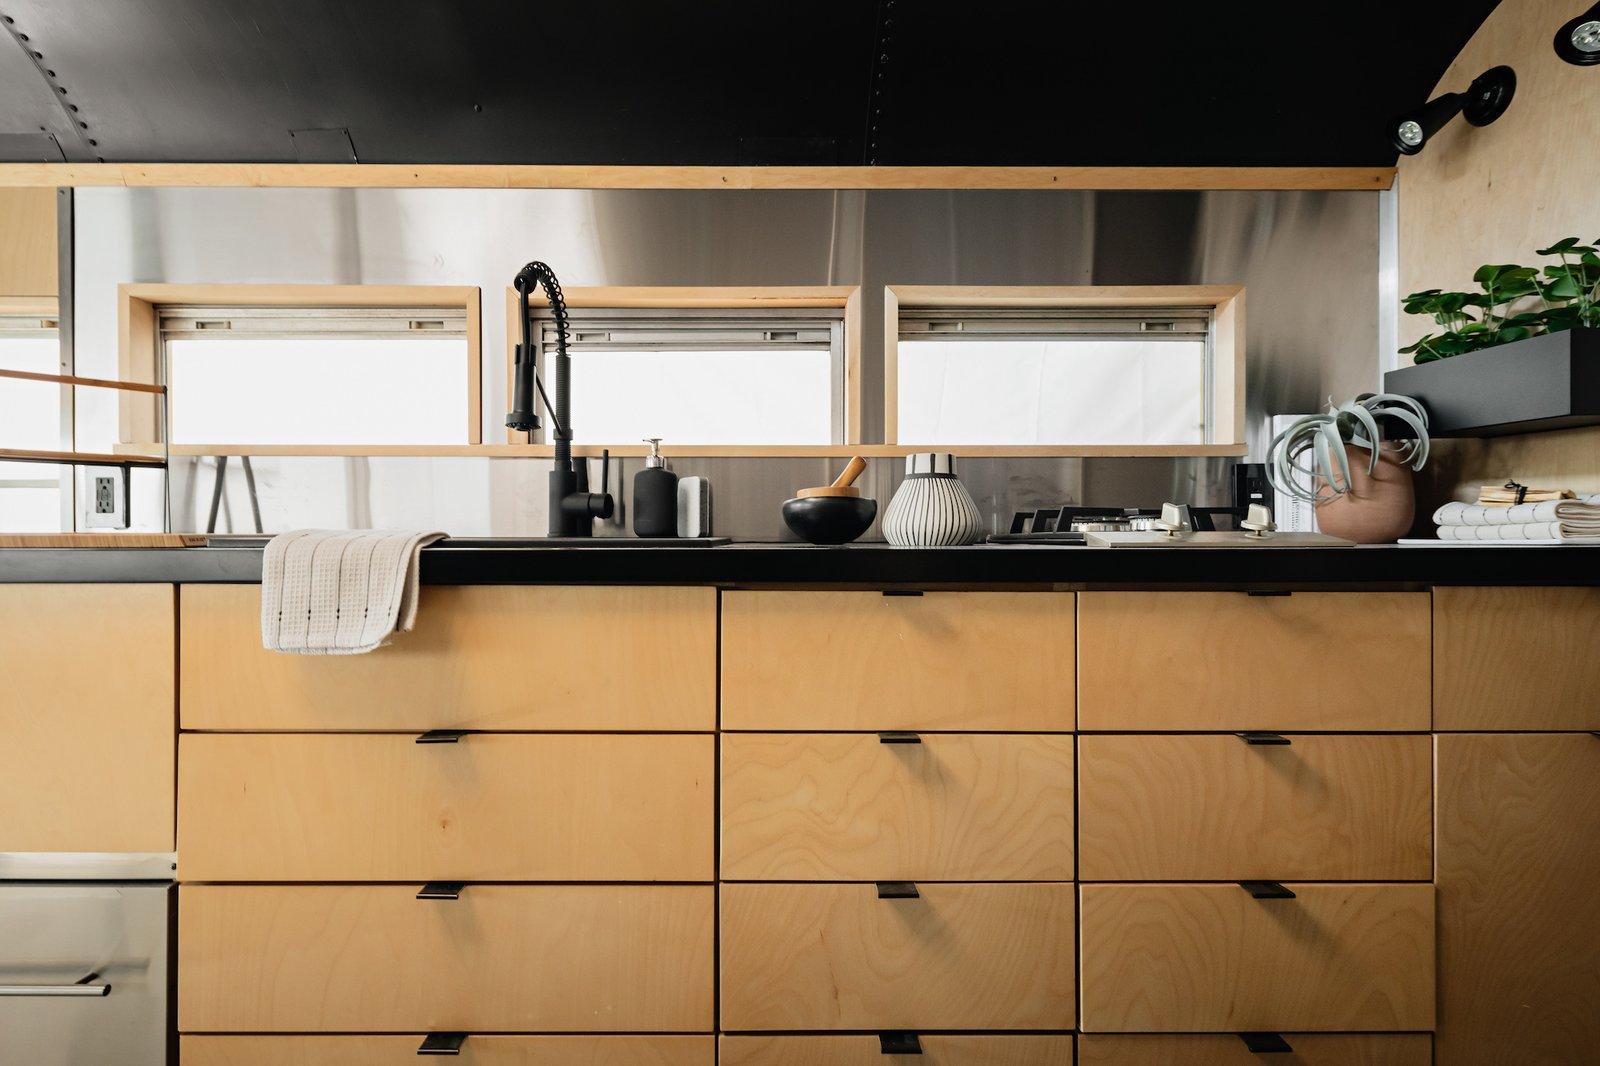 Kitchen of Scandinavian Skoolie by Killdisco Design.